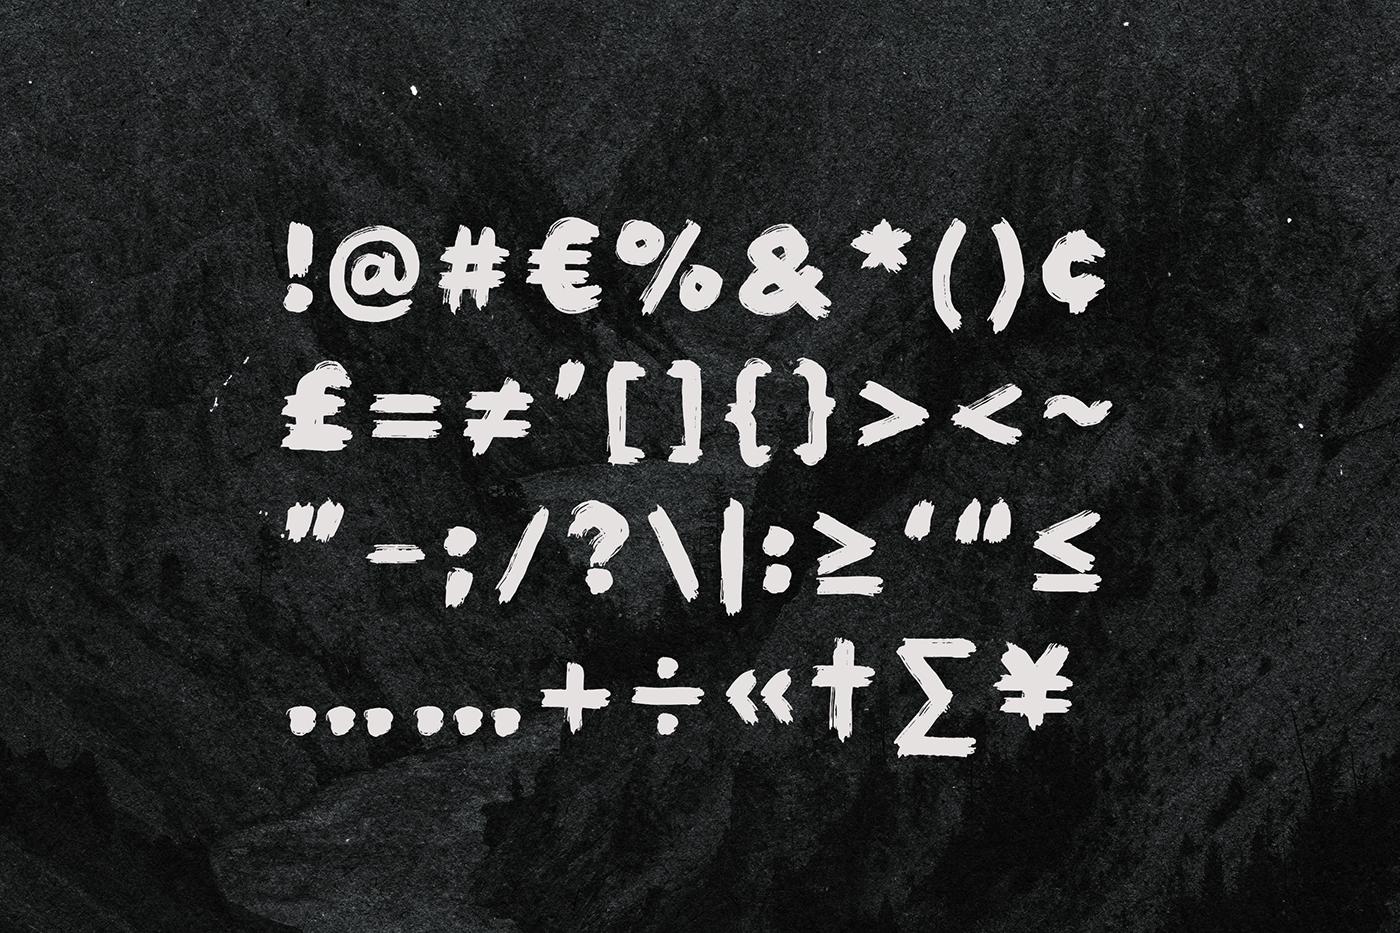 Typeface font brush script hand drawn font painted type type hand drawn type Painted textured brush